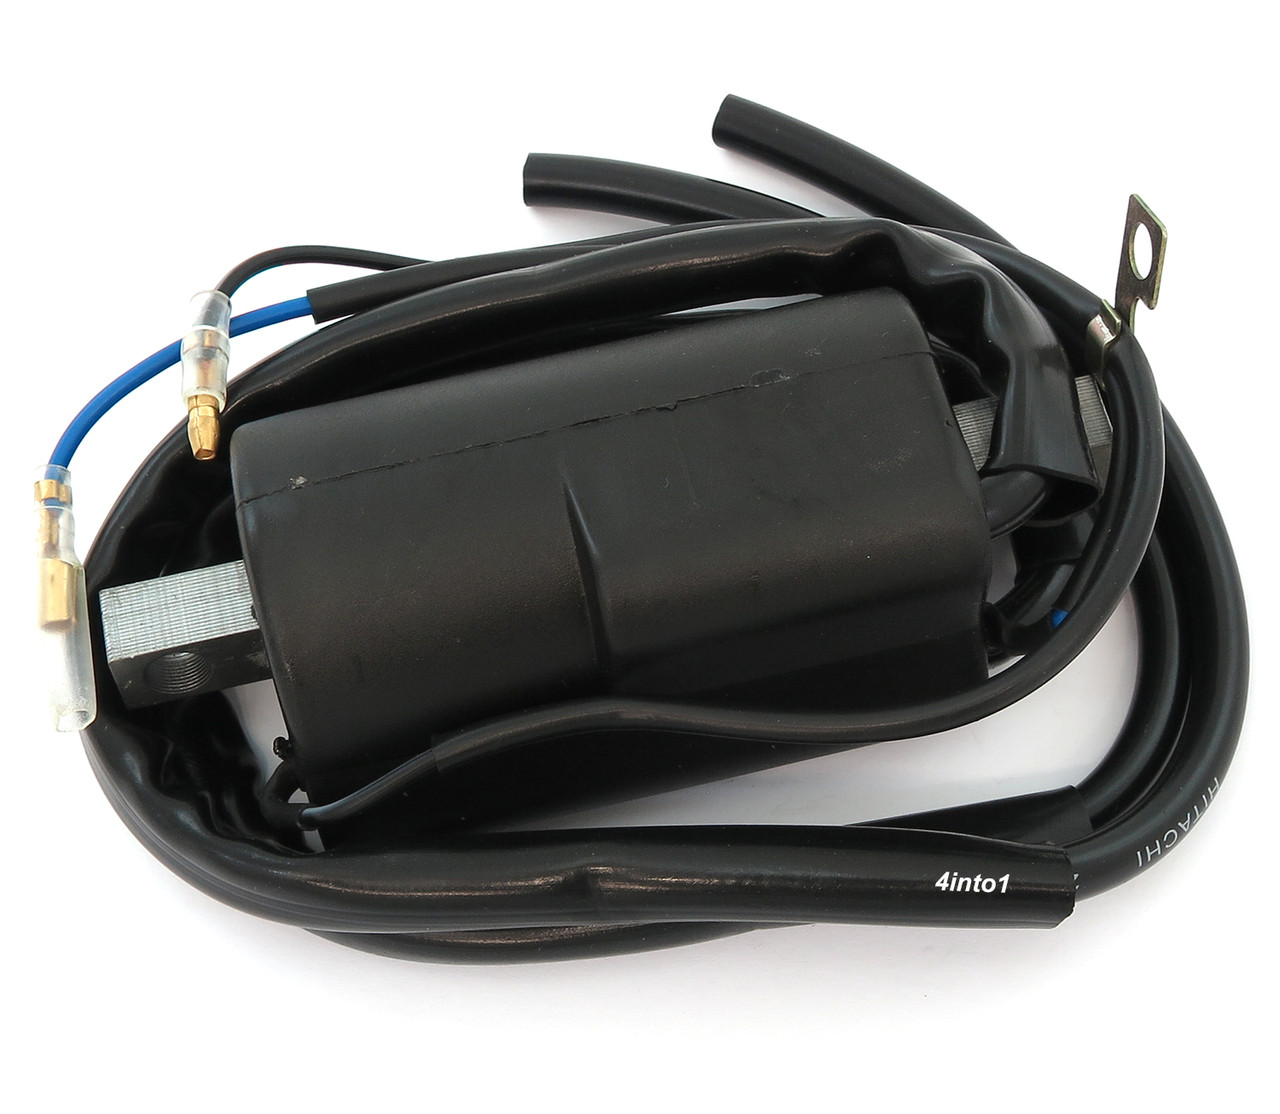 medium resolution of honda ignition coil 30501 300 003 cb350f 400f 500 550 750 cb500 coil wiring